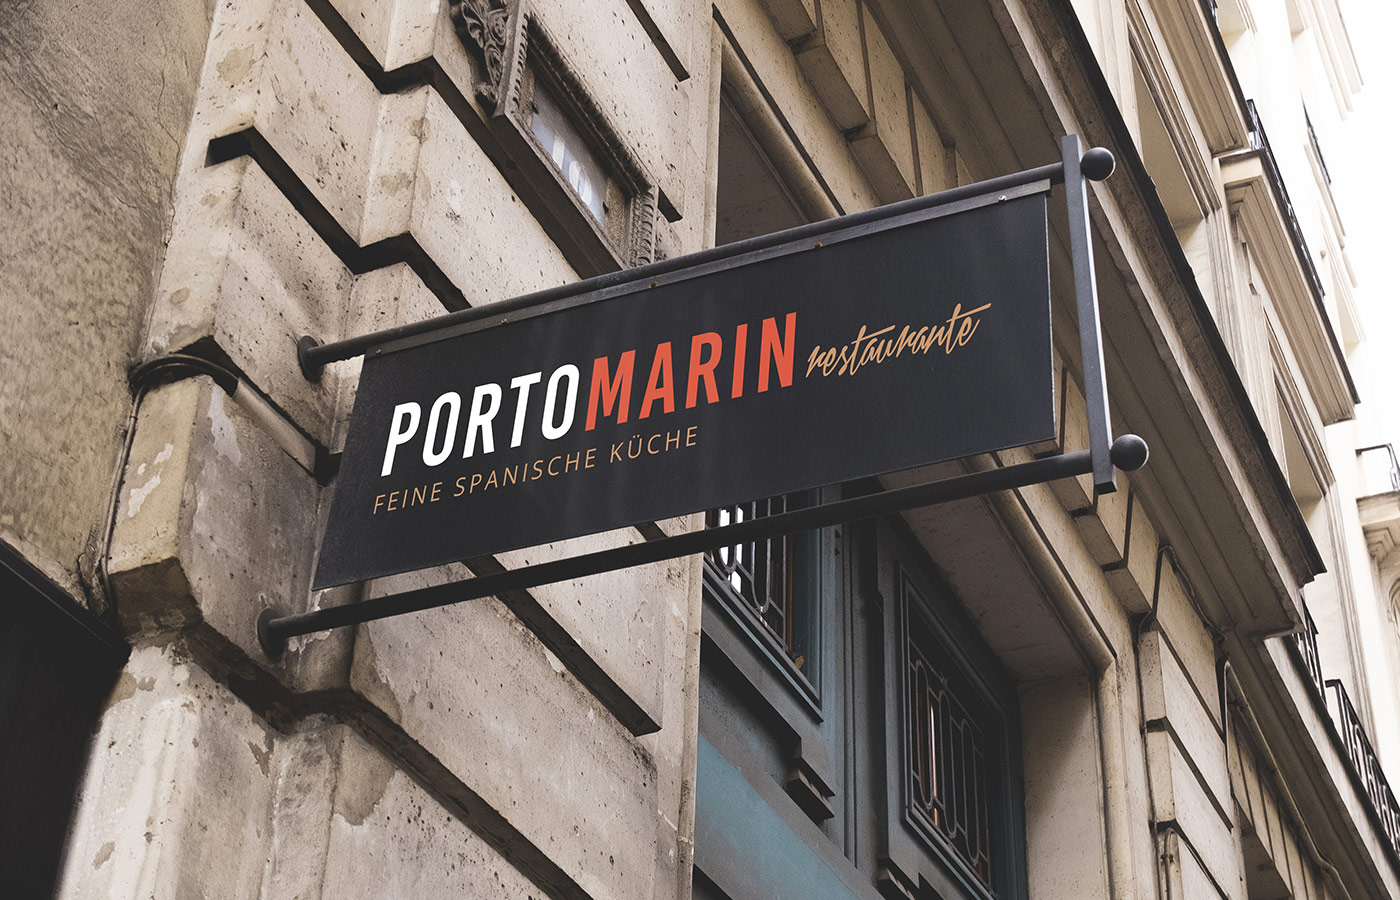 PORTOMARIN_sign